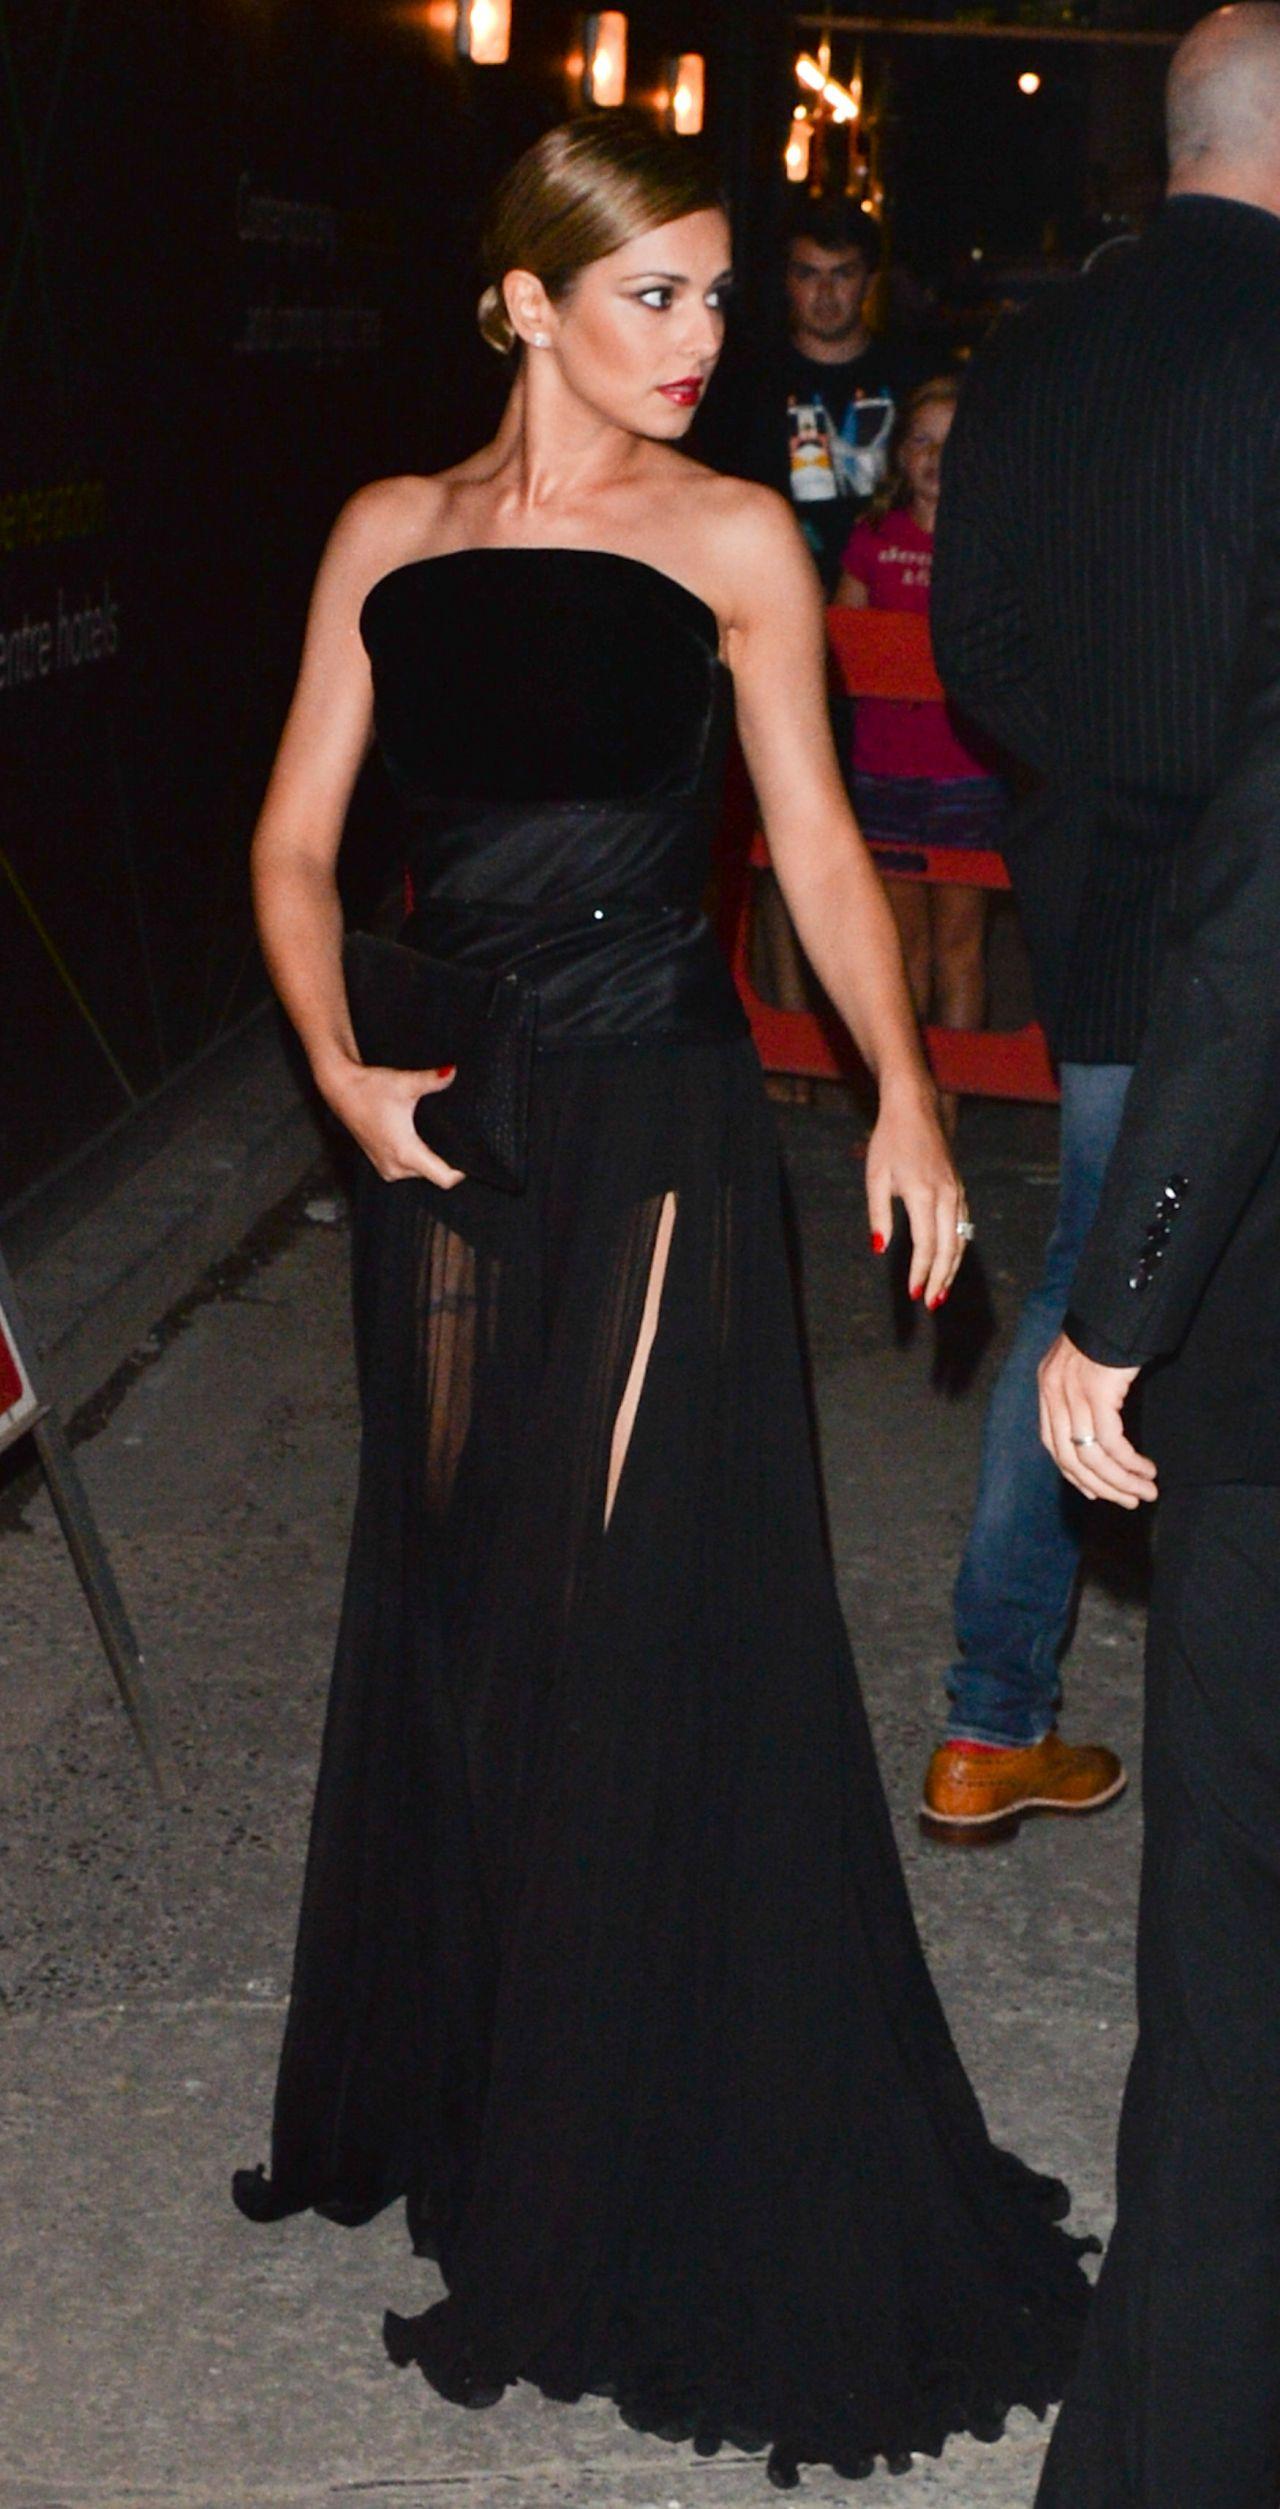 Cheryl Cole (Cheryl Fernandez-Versini) - Wedding Party in London - July 2014